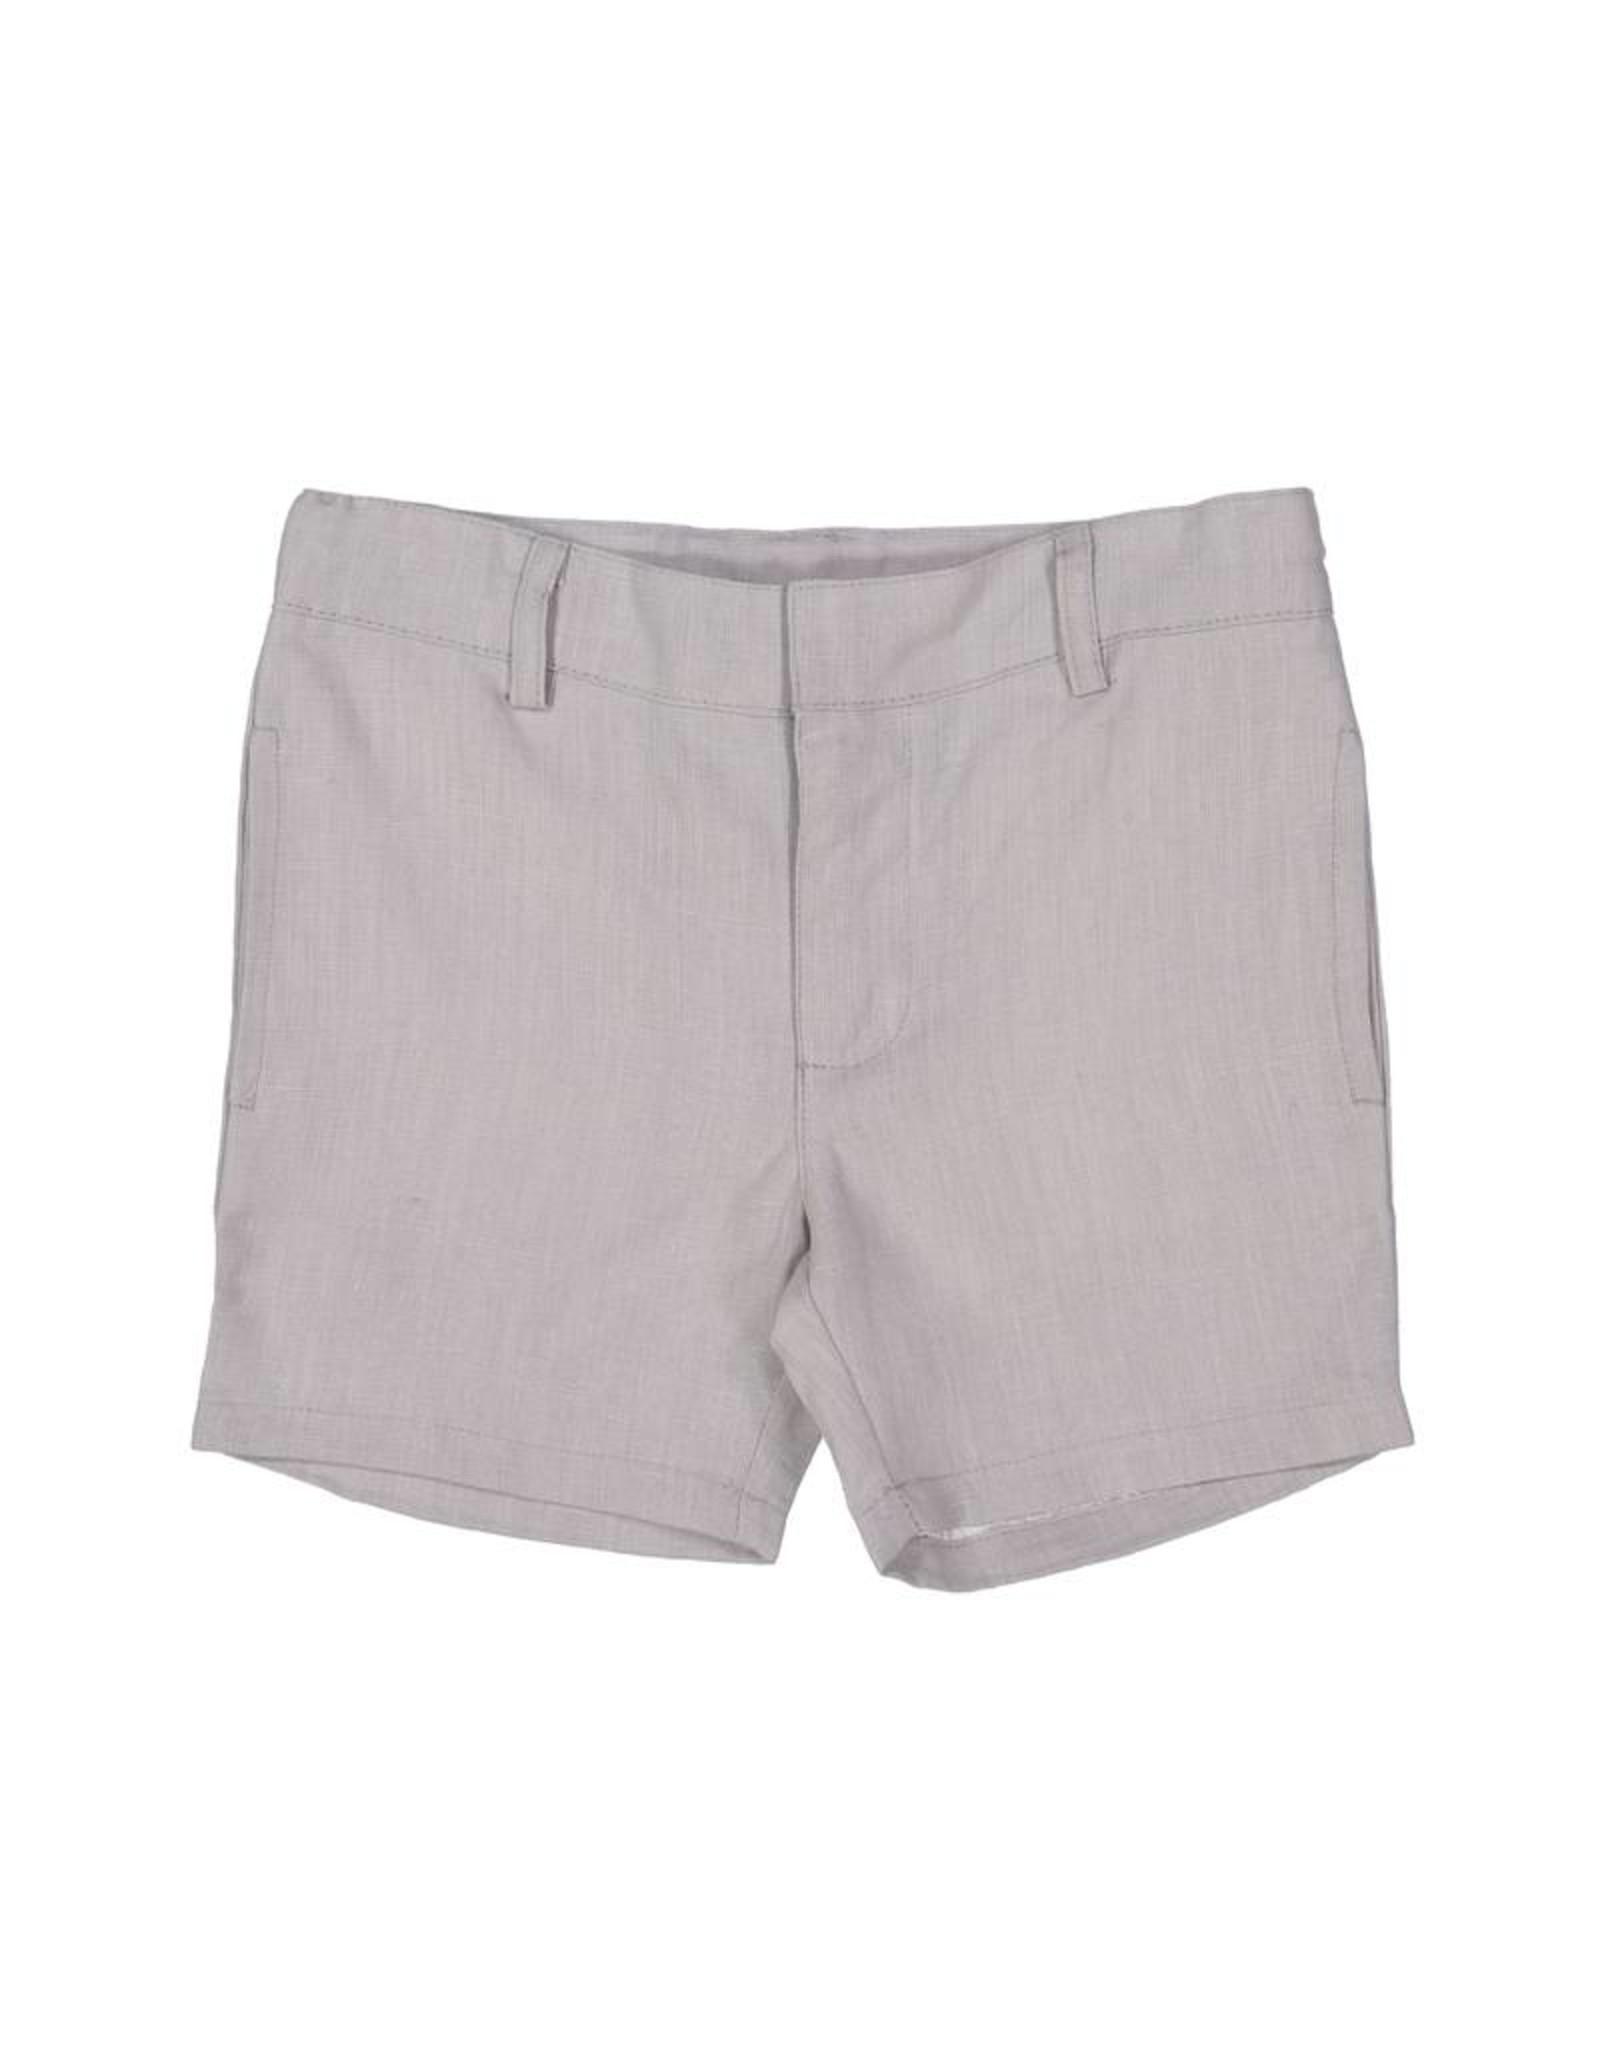 Analogie Analogie SS19 Linen Boys Shorts